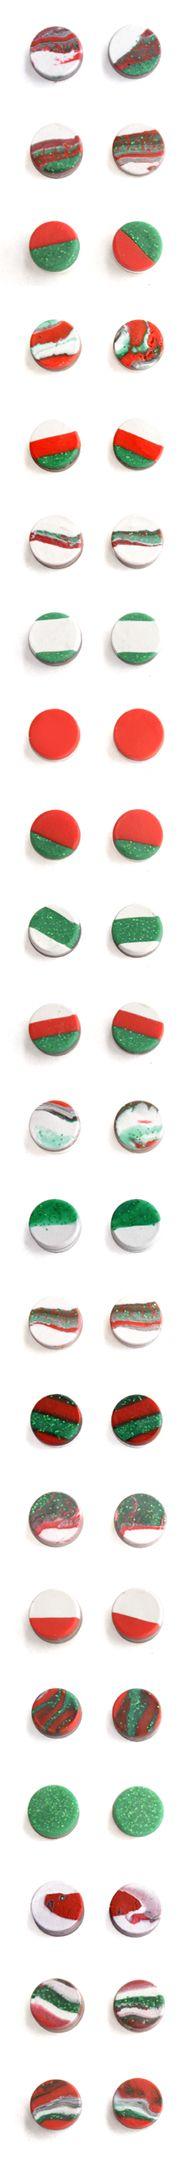 Holiday Season Stud Earrings! Awesome!